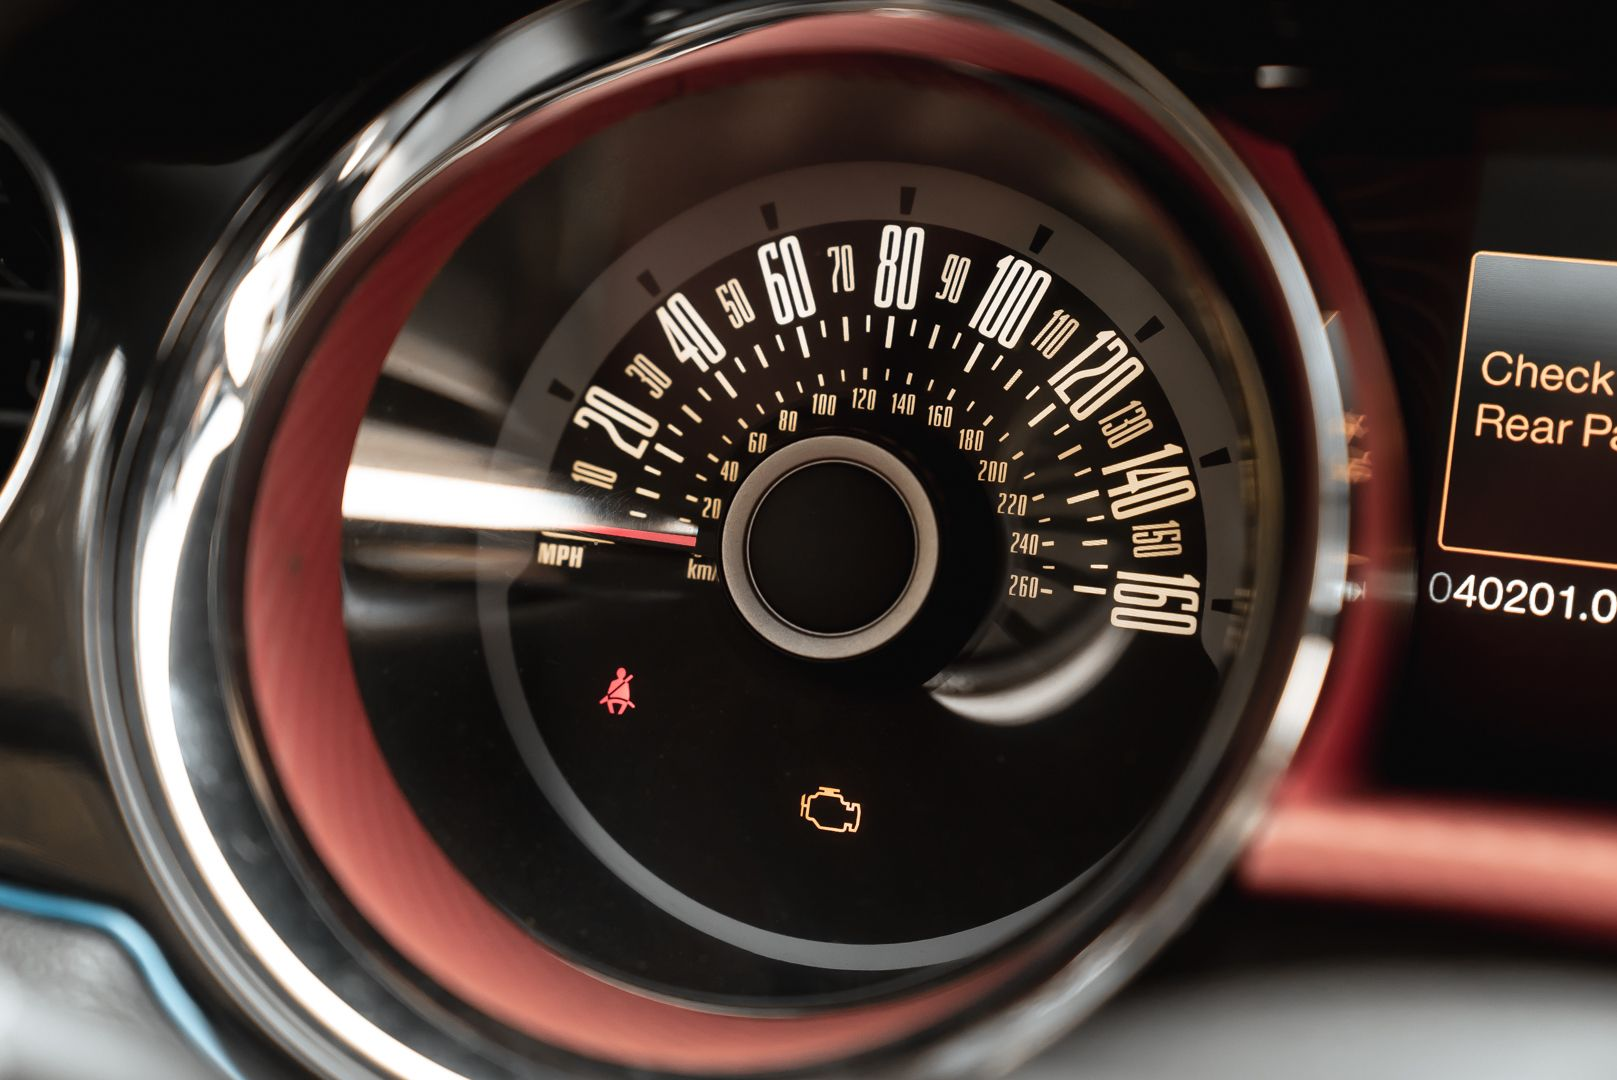 2012 Ford Mustang 5.0 V8 82101